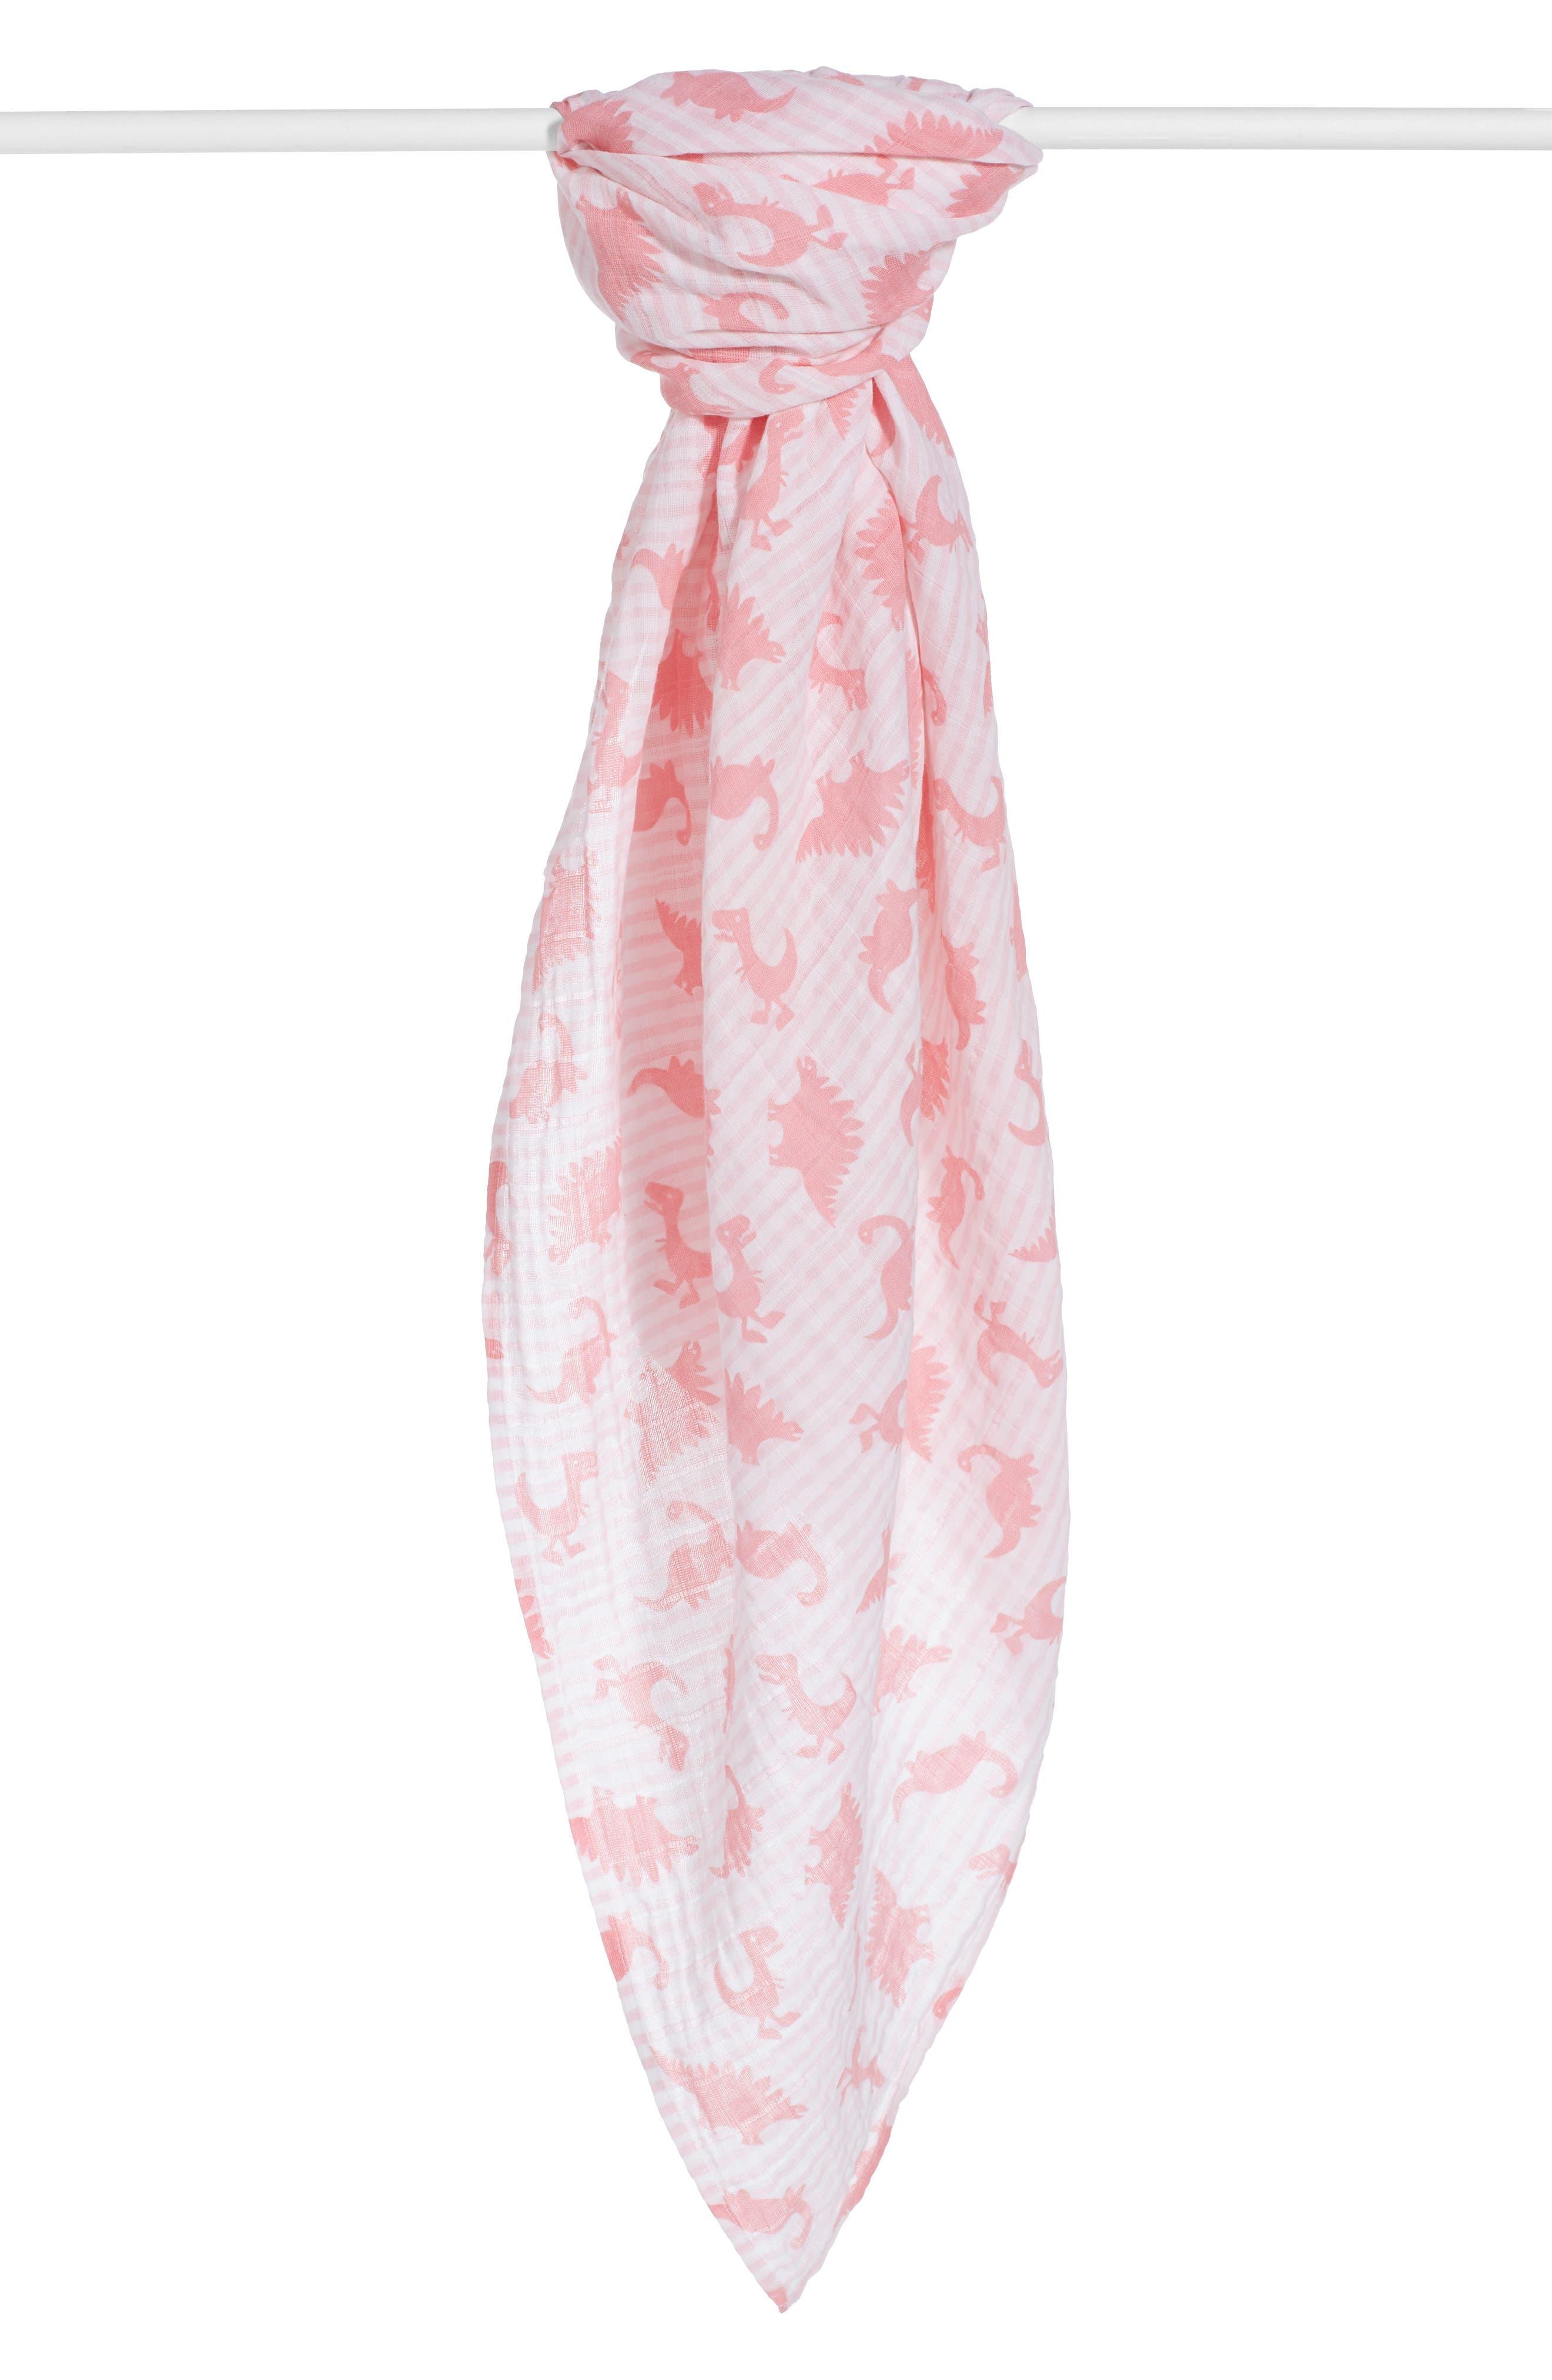 Cotton Swaddle Blanket,                             Main thumbnail 14, color,